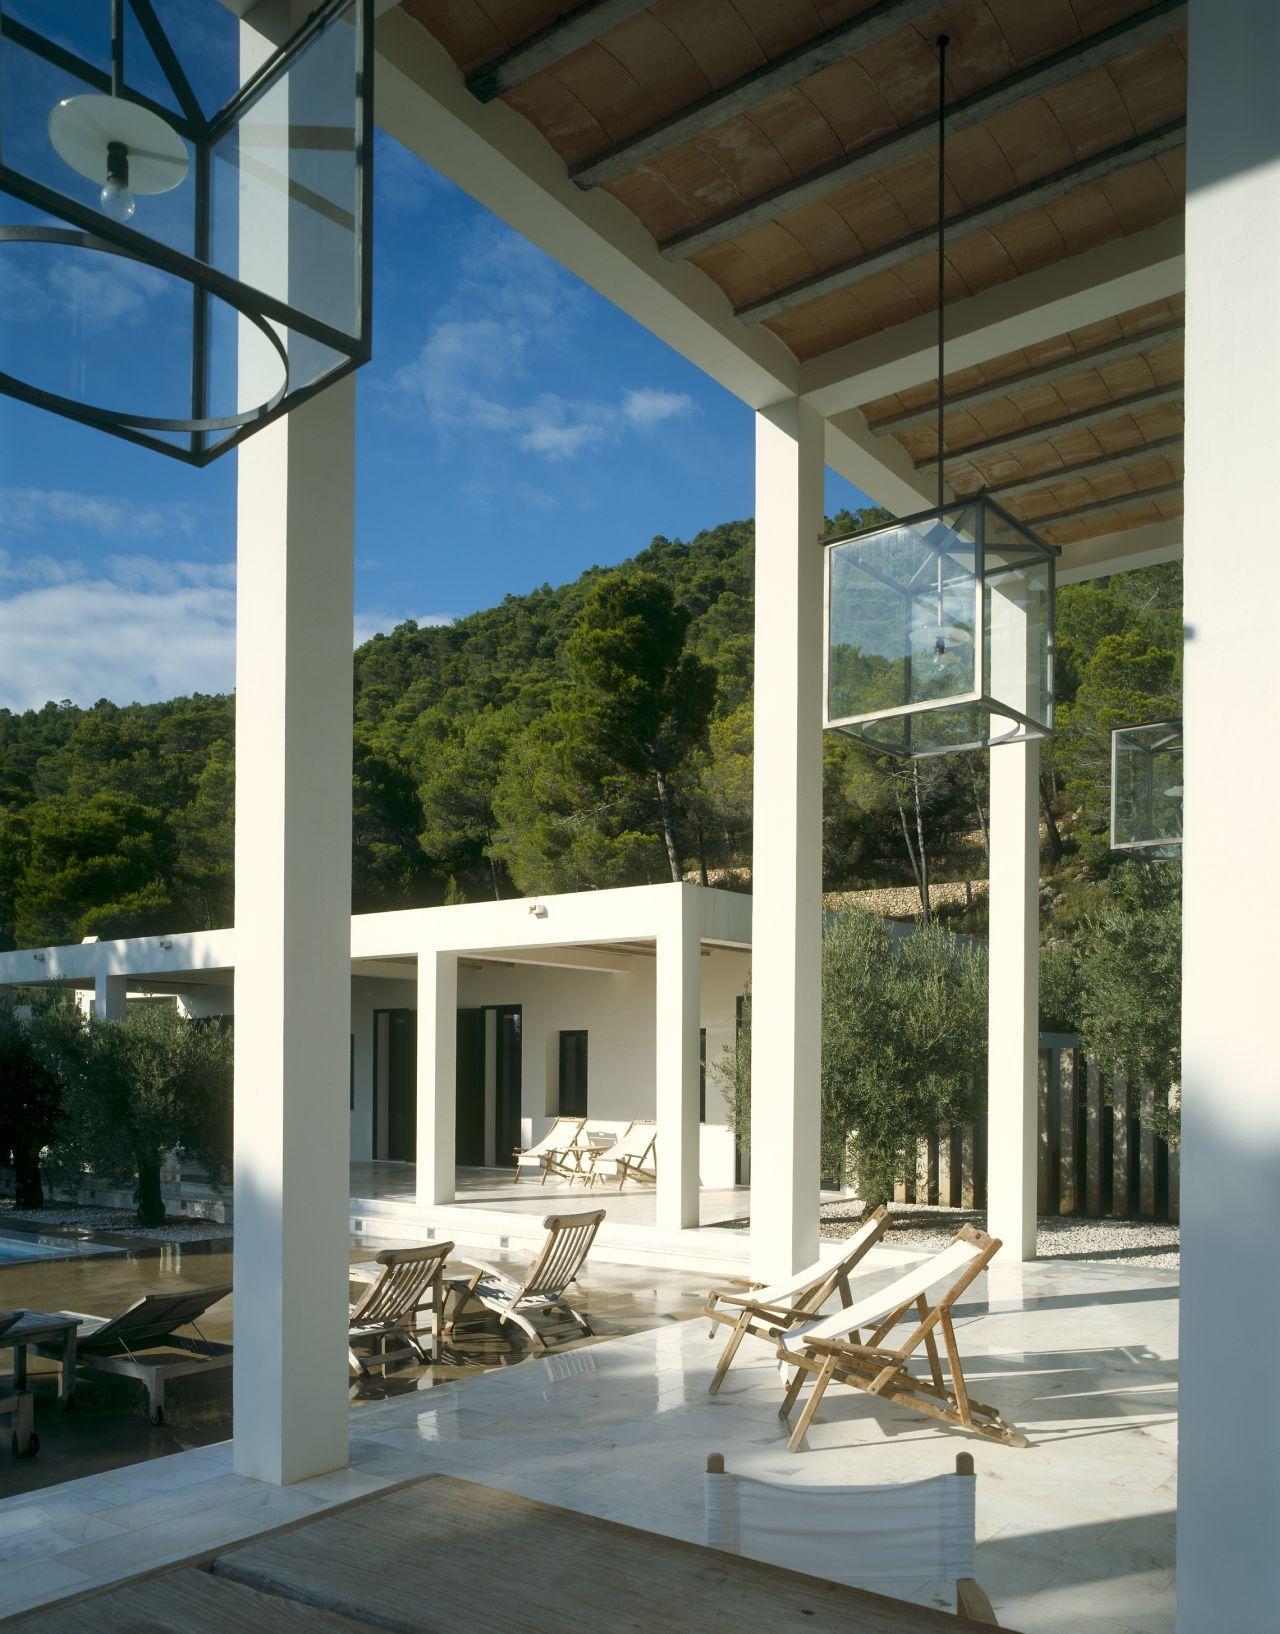 Casa em Valle de Morna / de Blacam and Meagher architects, Cortesia Peter Cook